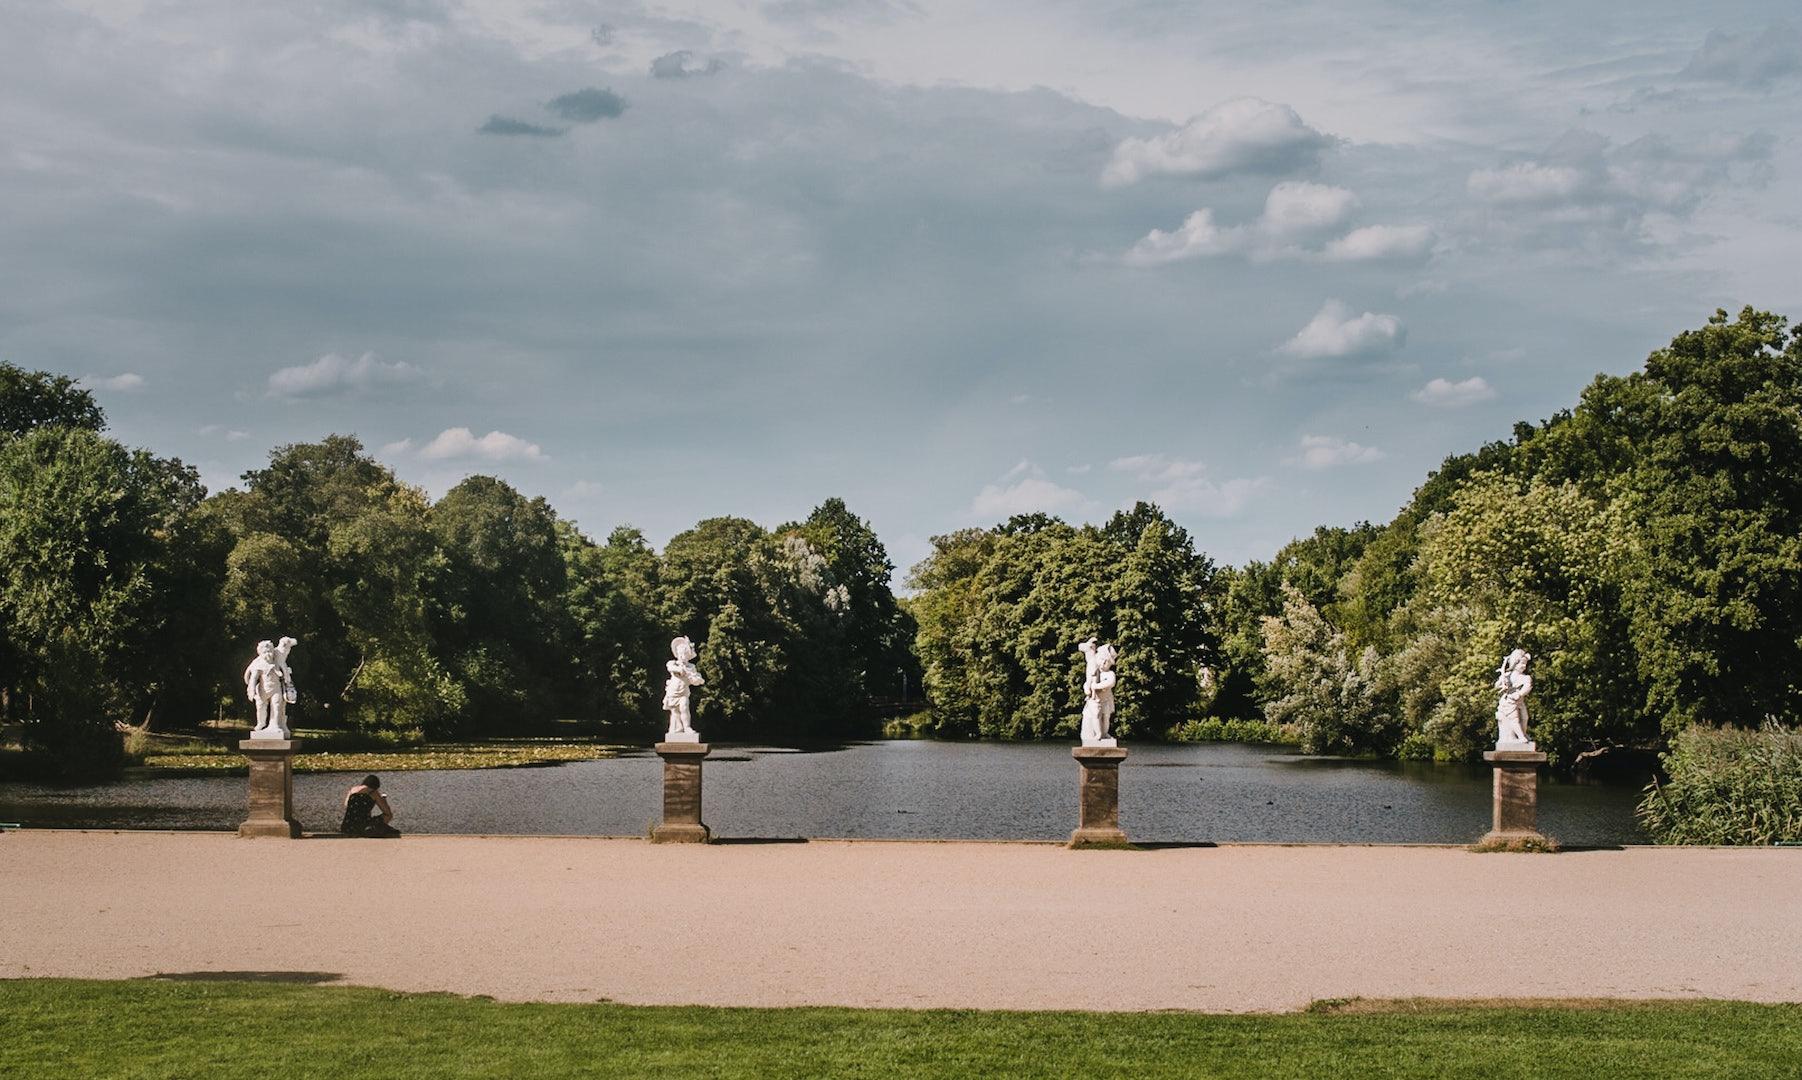 the garden at the Schloss Charlottenburg